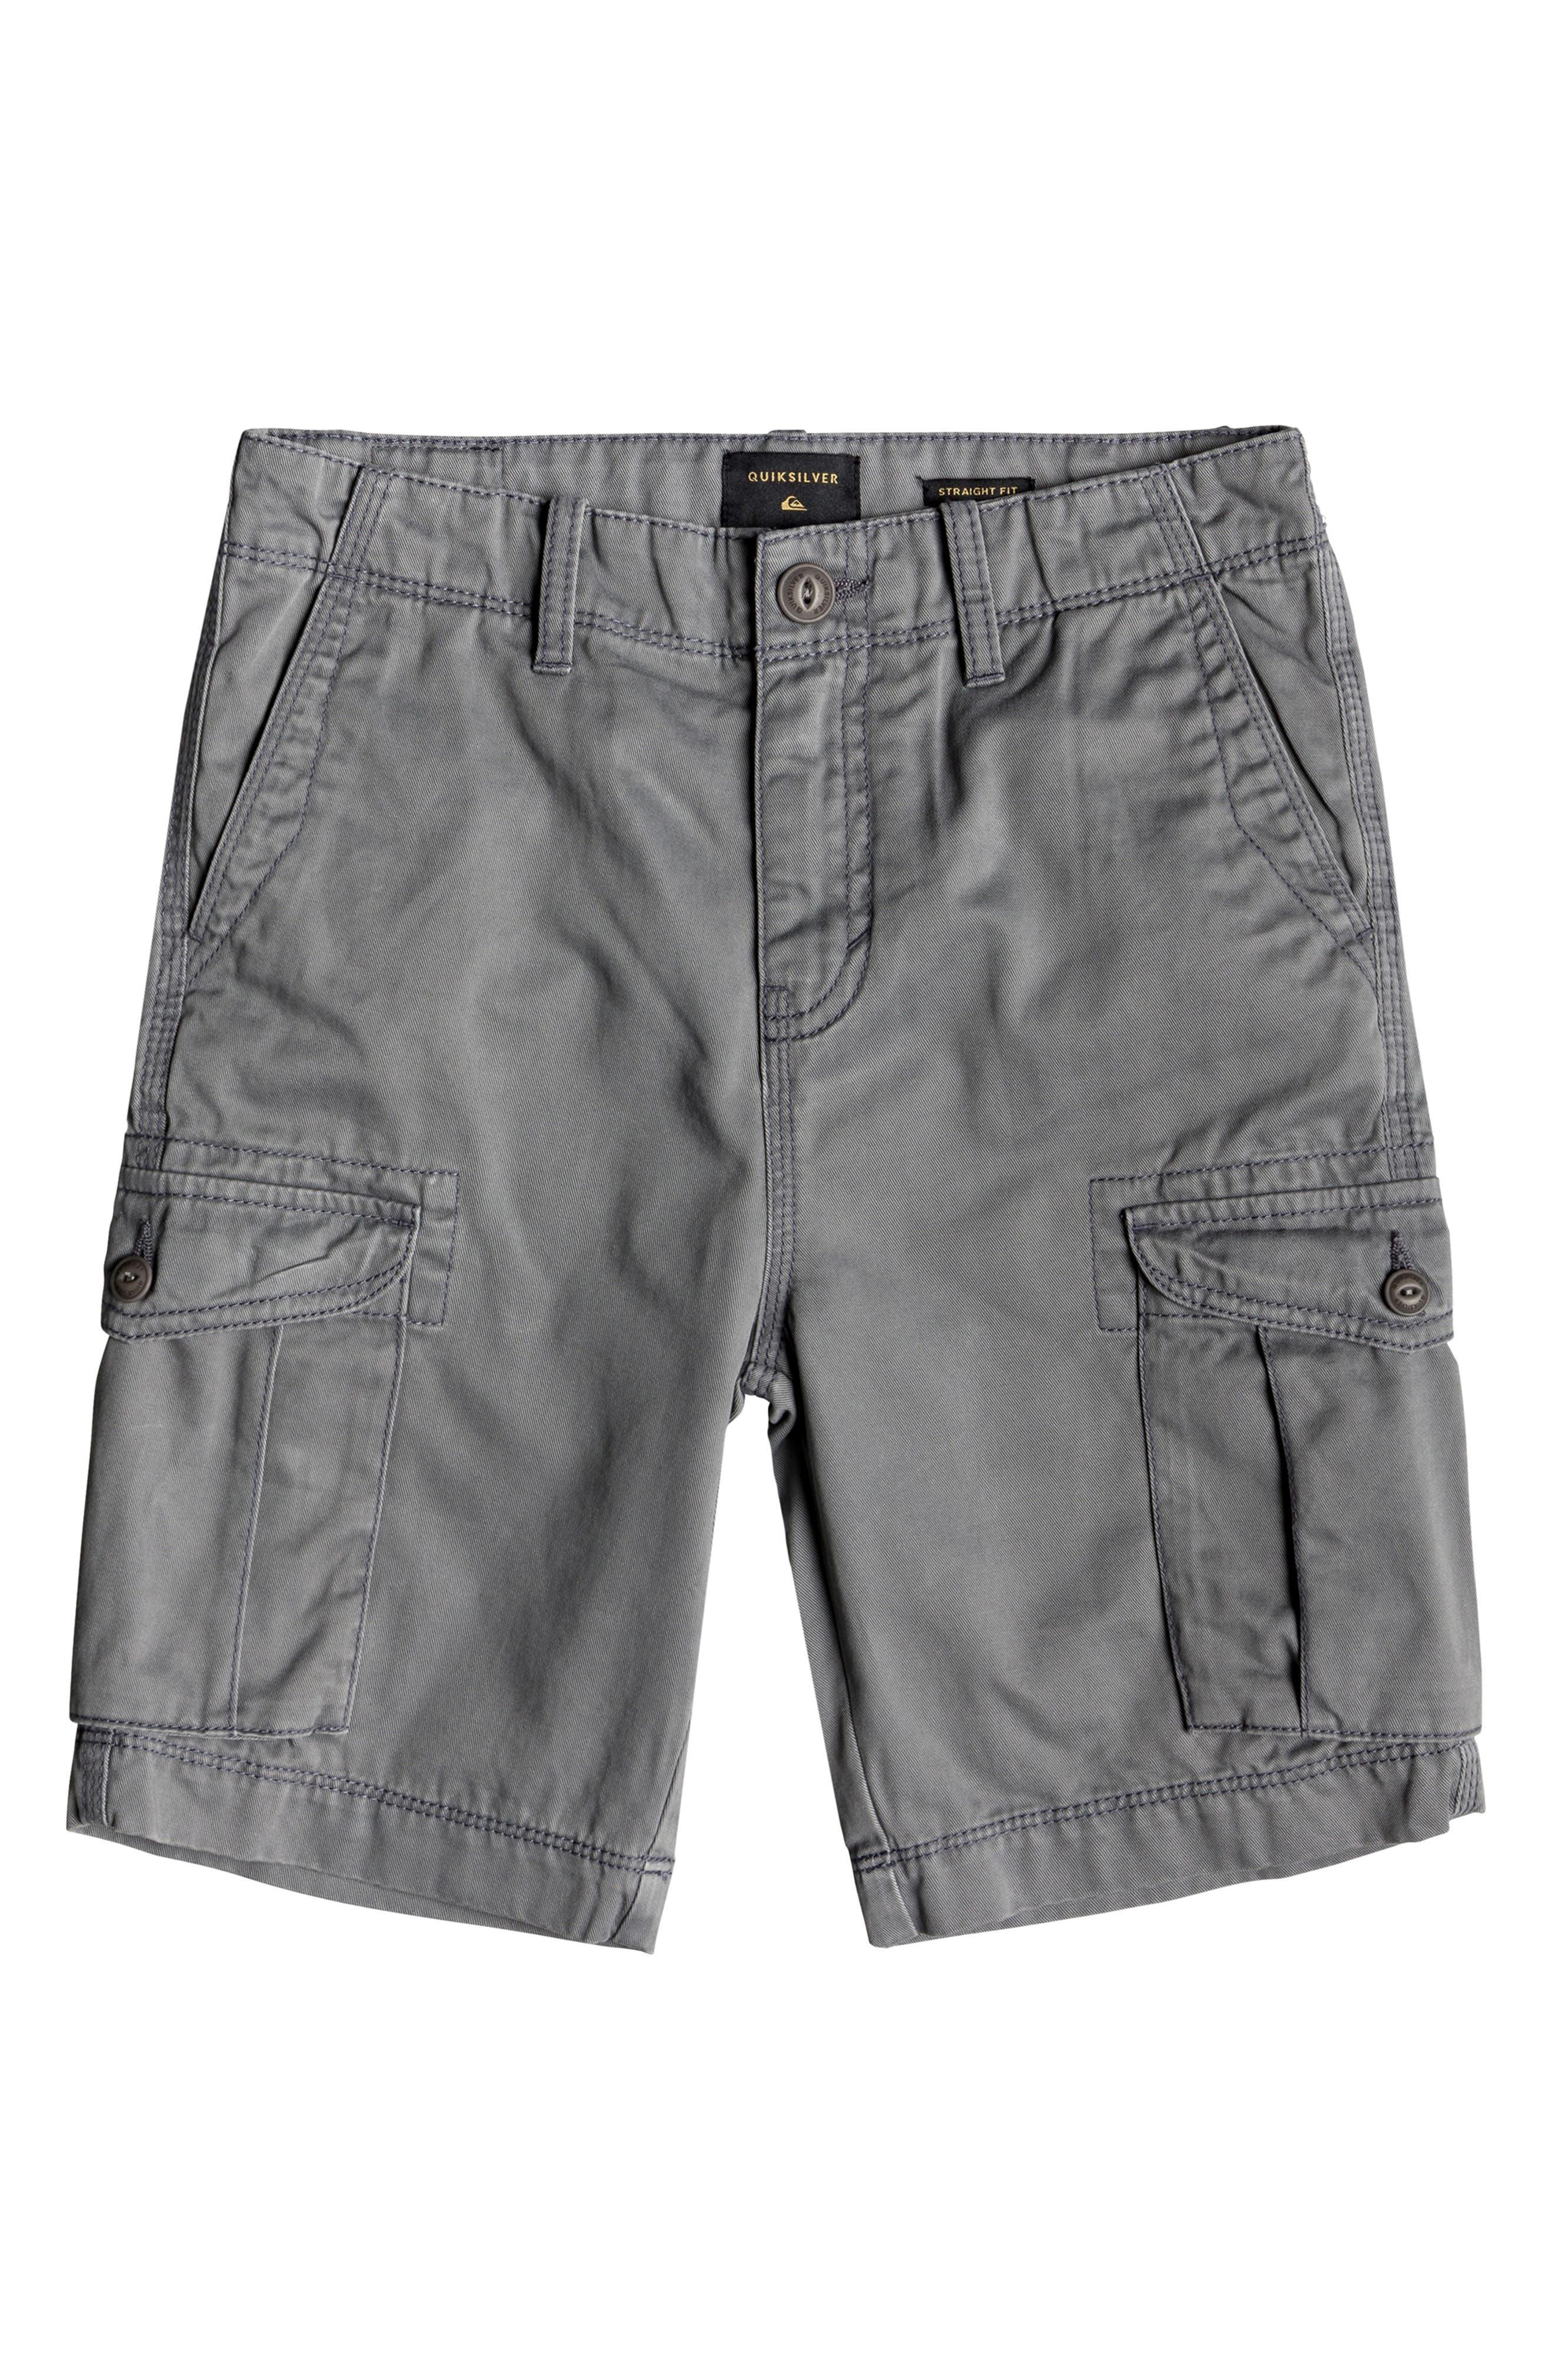 Crucial Battle Cargo Shorts,                             Main thumbnail 1, color,                             QUIET SHADE